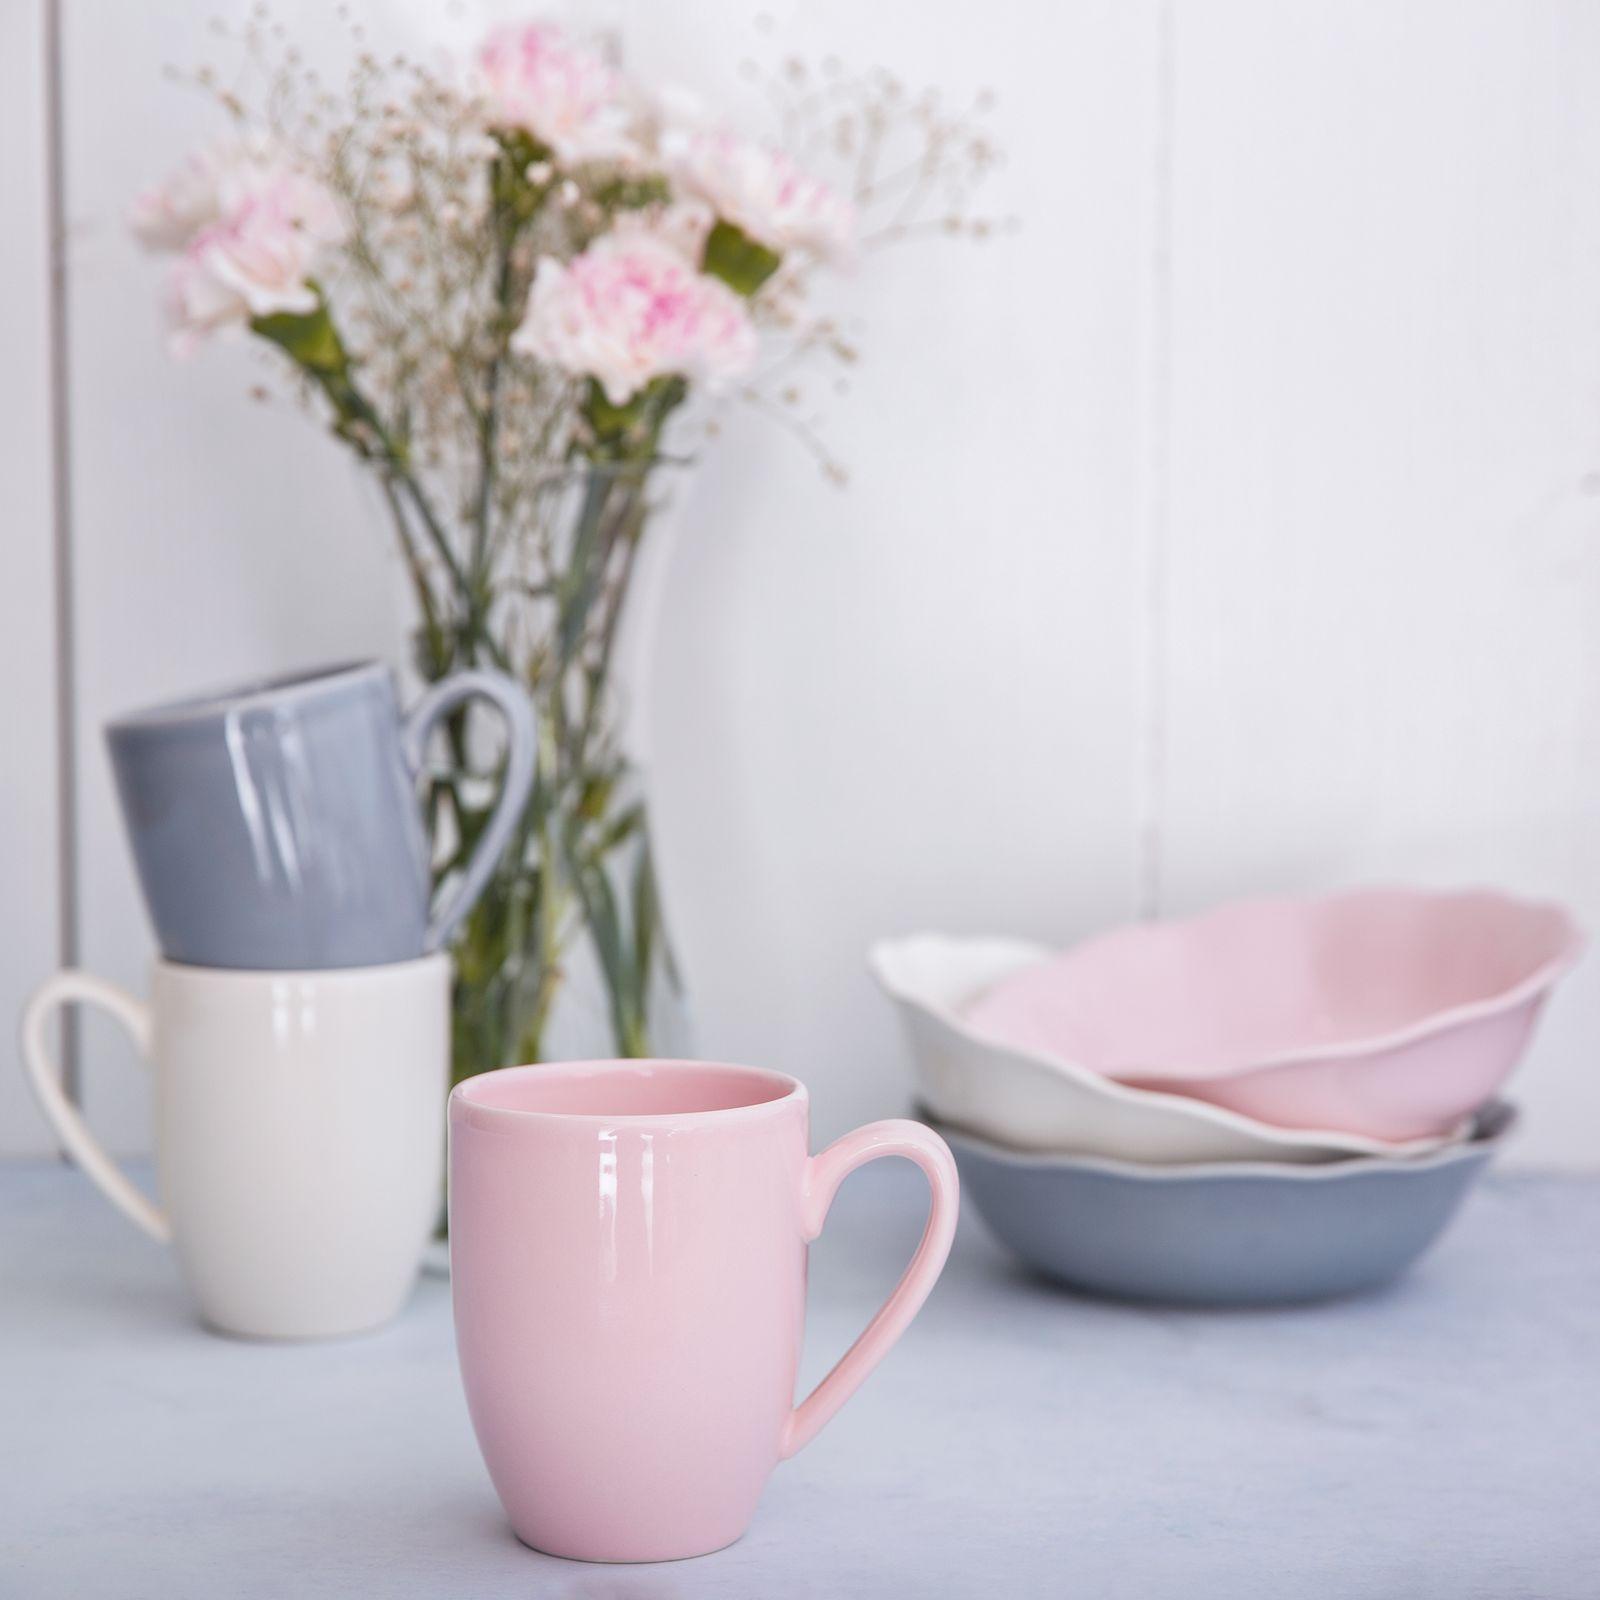 Kubek Diana Rustic 300 ml Pink AMBITION